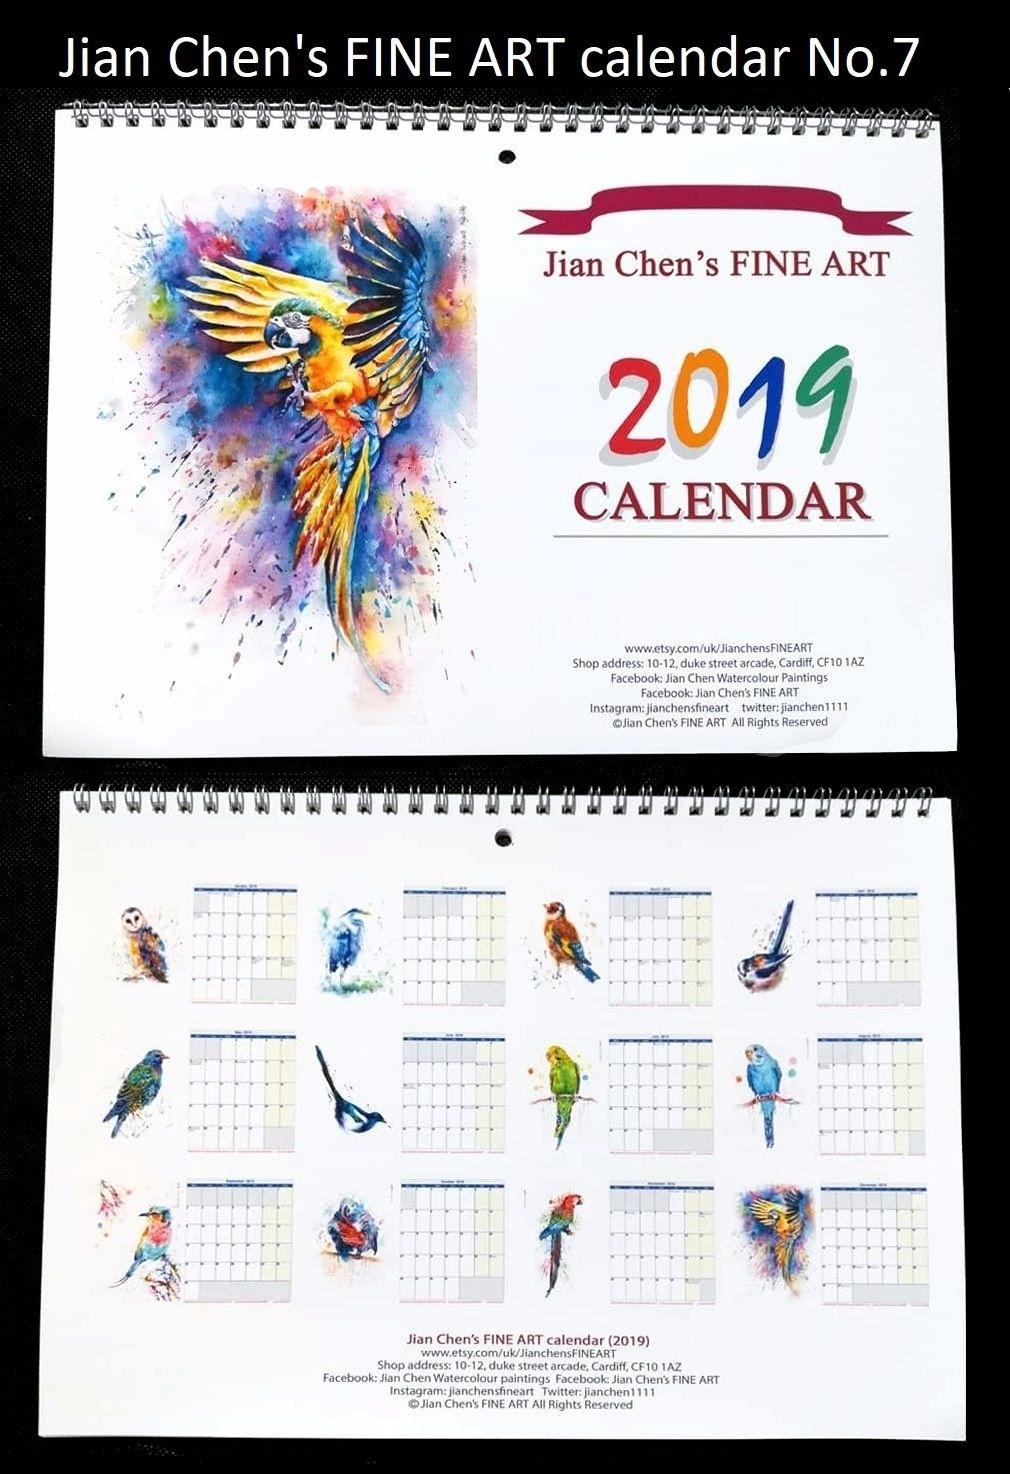 Calendar Printing In Lotus Notes • Printable Blank Calendar Template_Calendar Printing In Lotus Notes